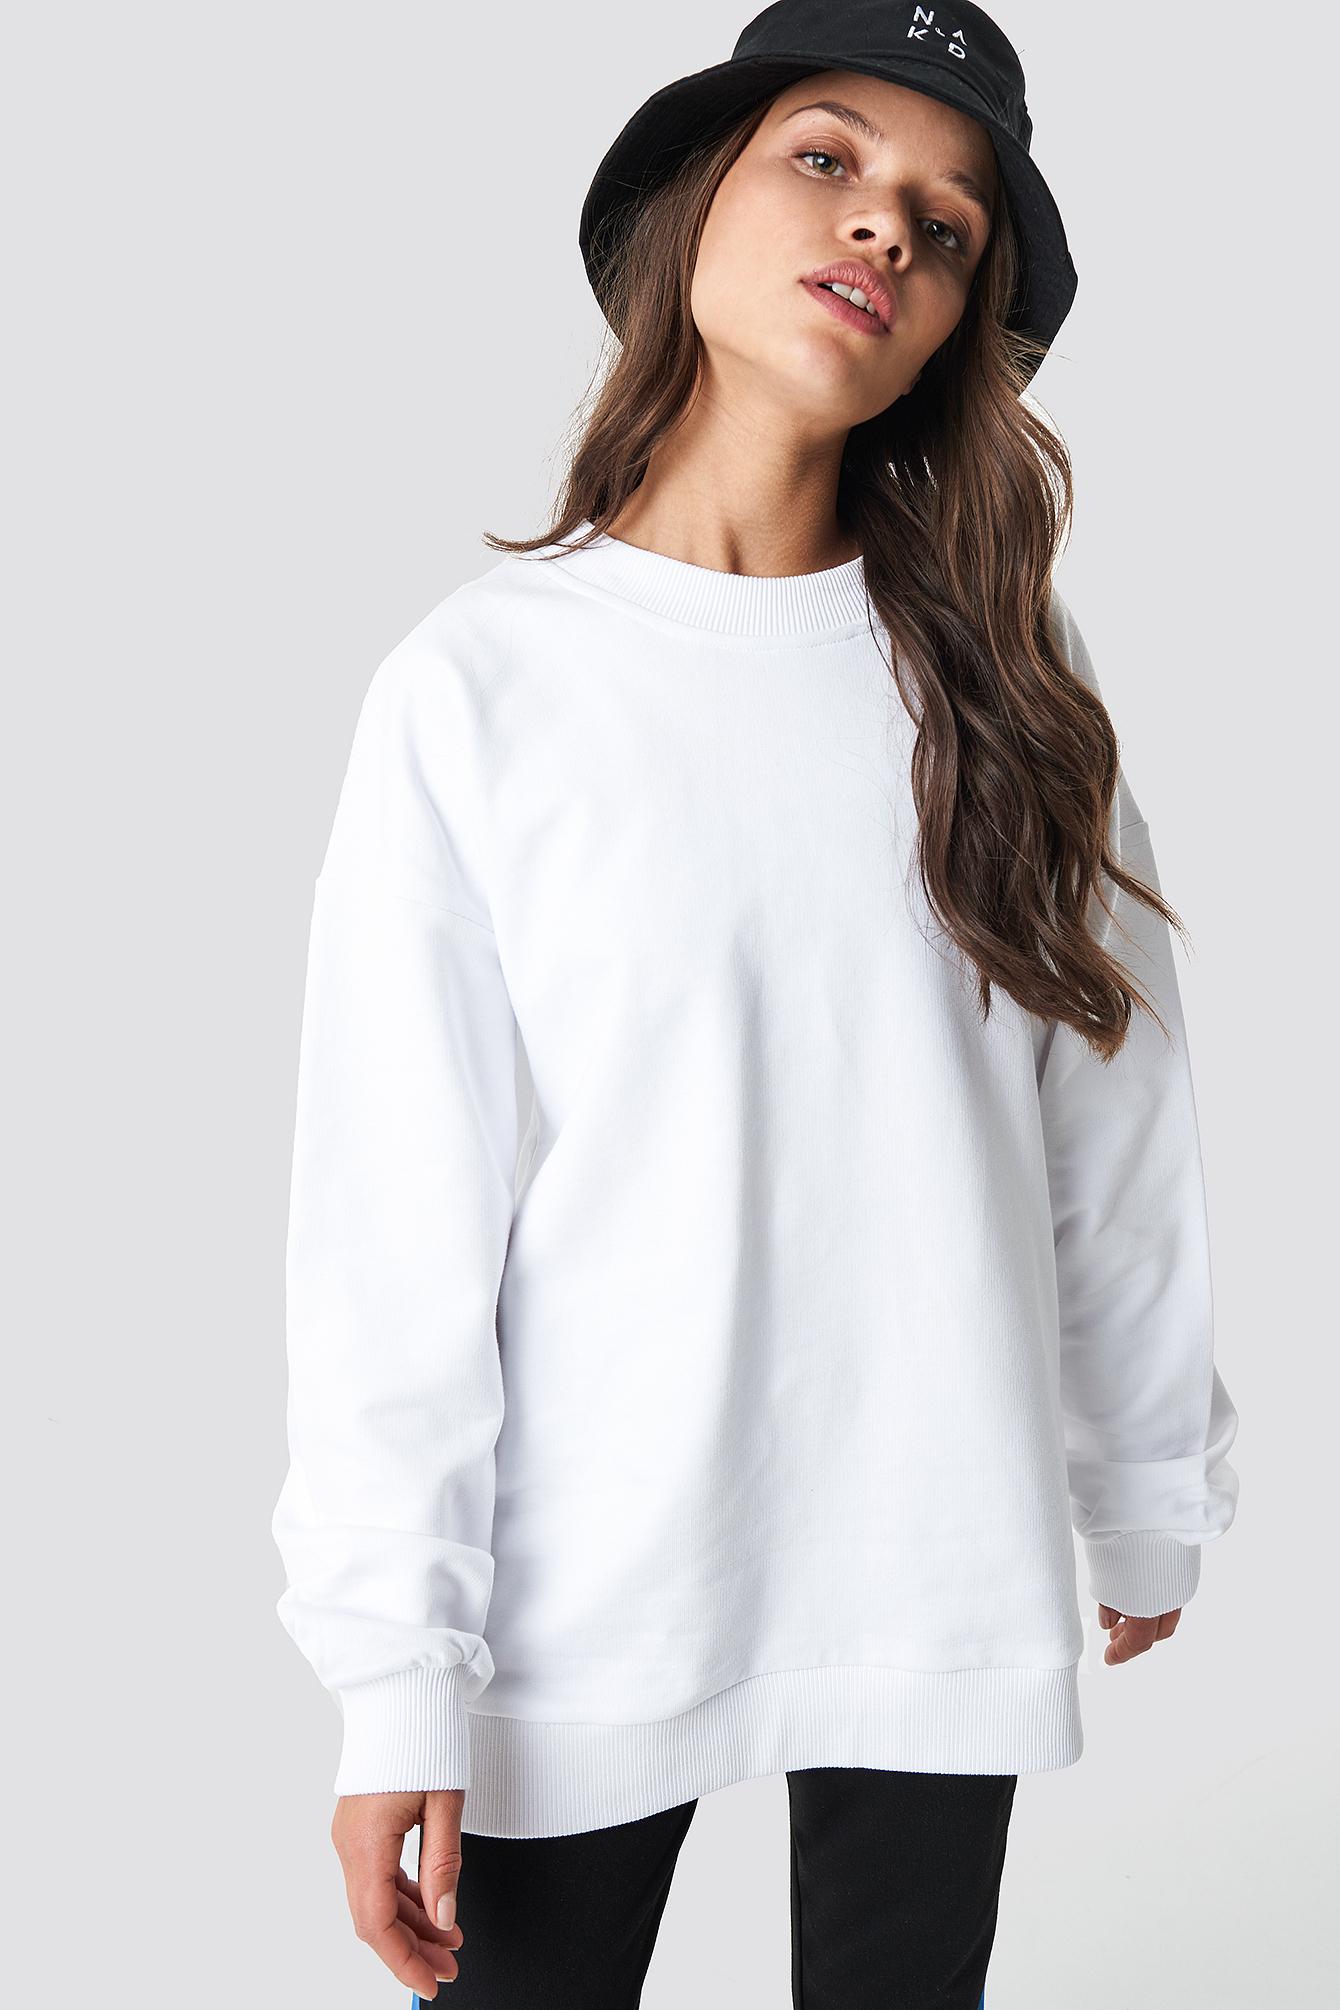 Unisex Sweatshirt NA-KD.COM